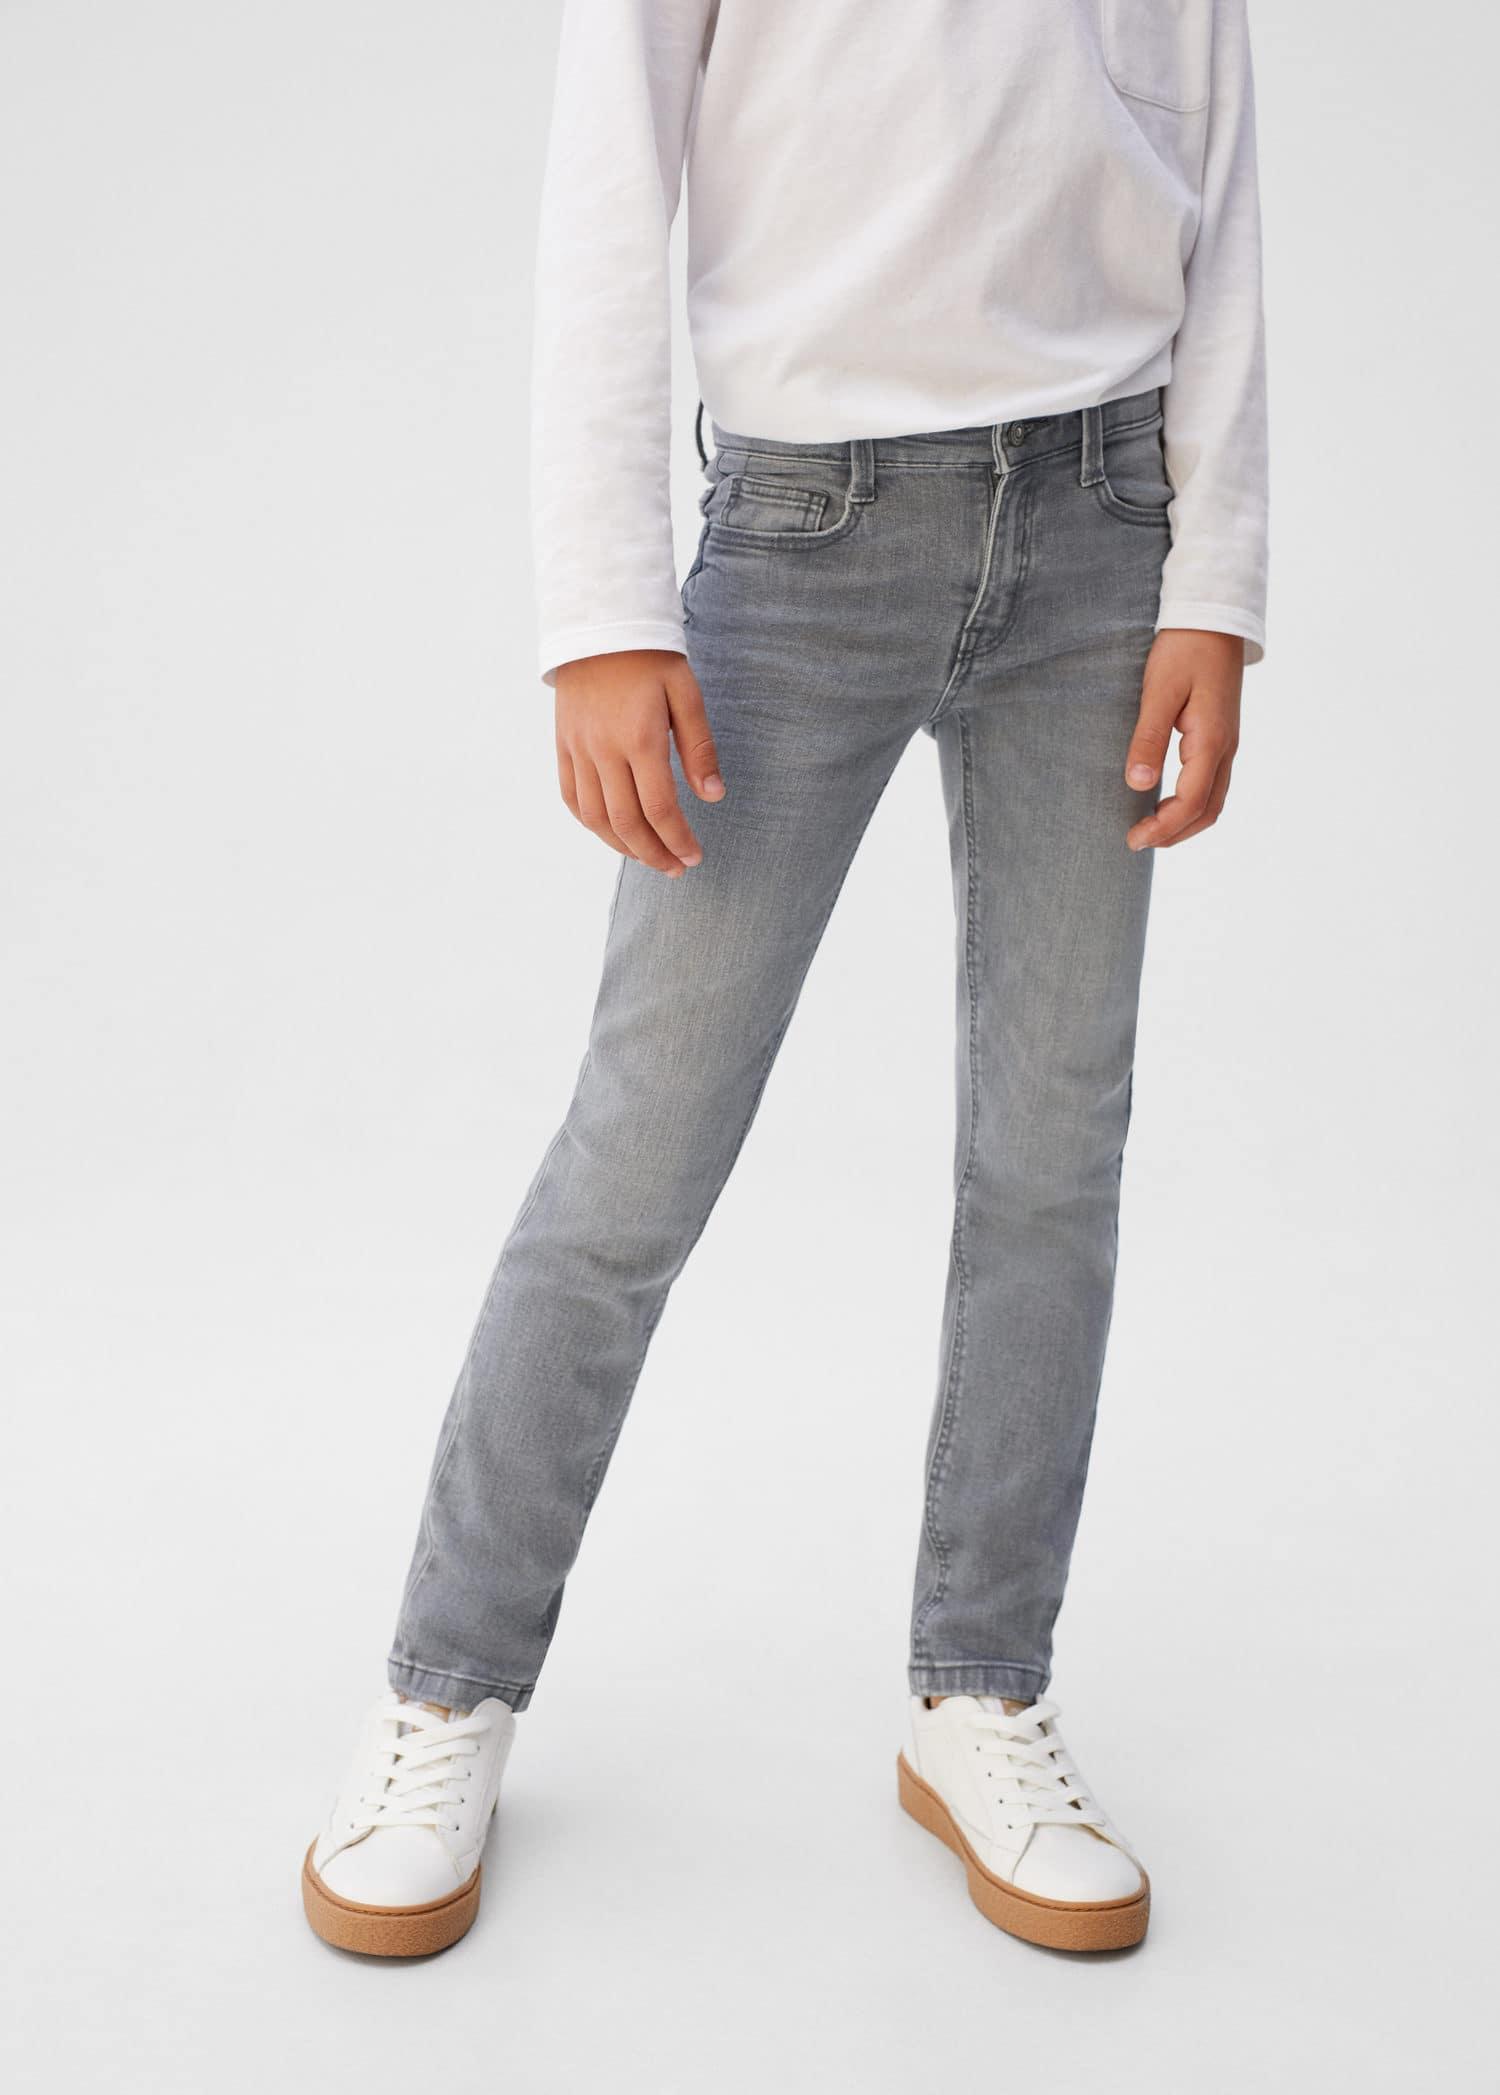 Essentials Jungen Jeans Boys Slim-fit Jeans